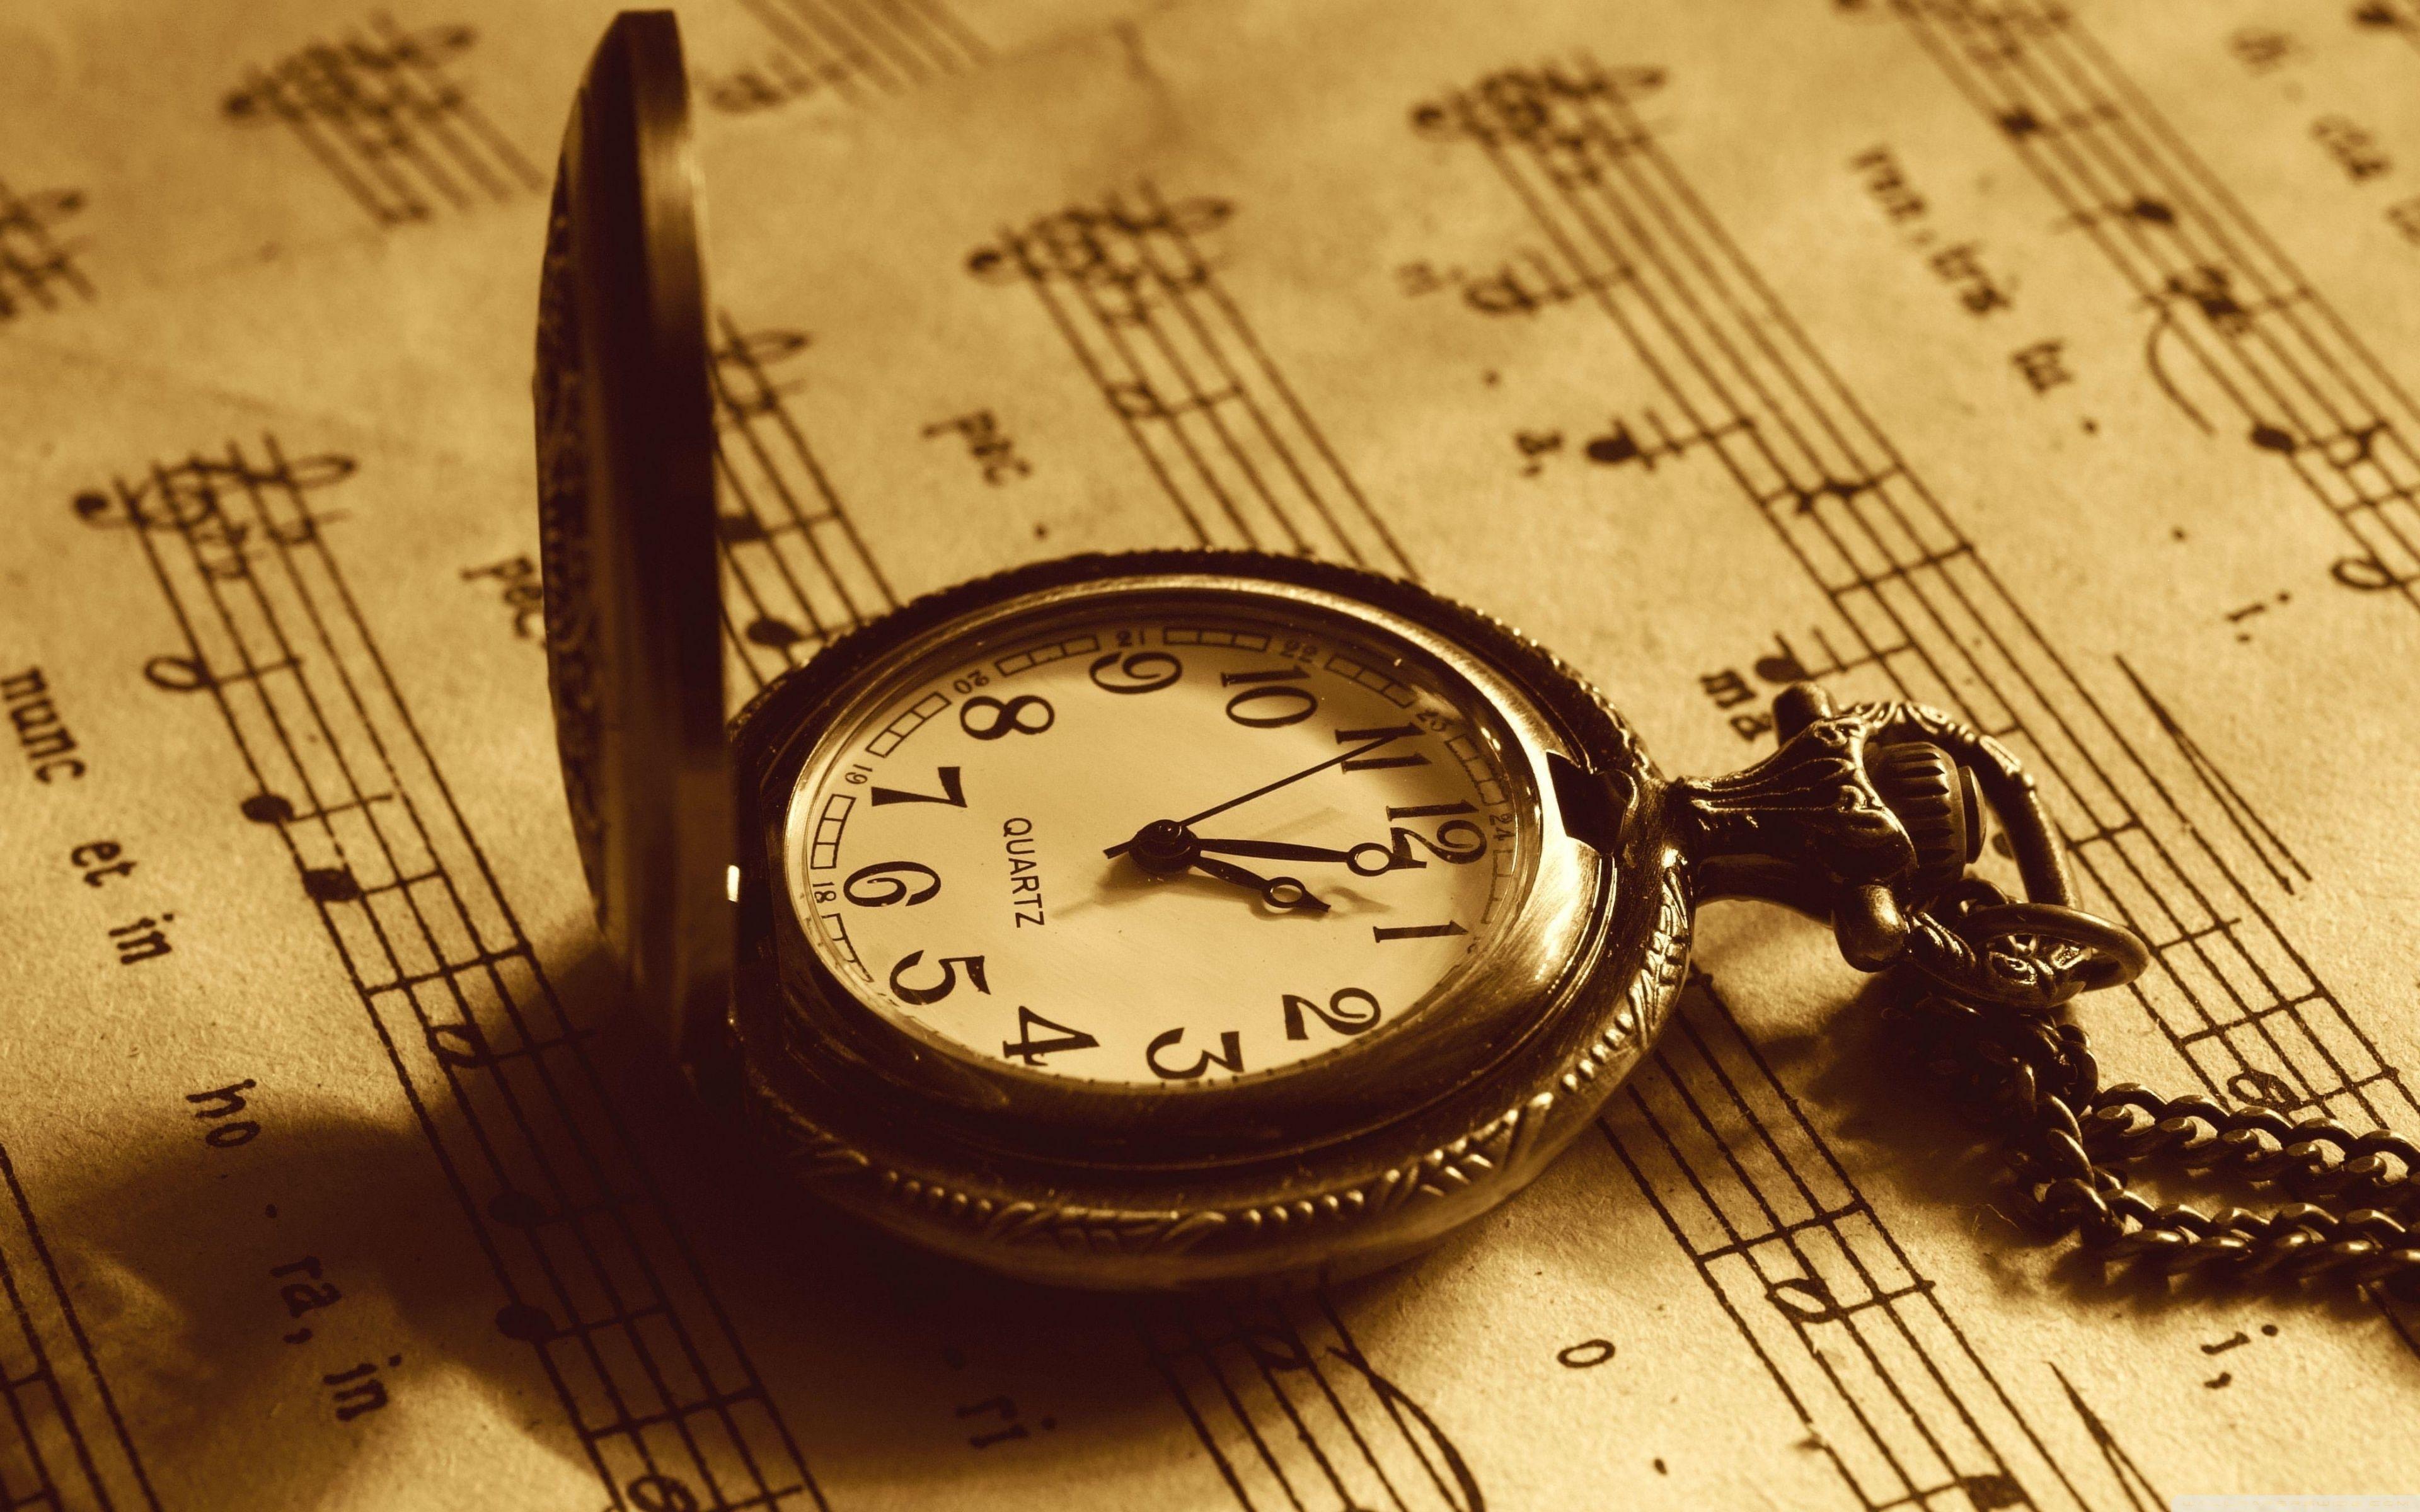 Clock Hd Wallpapers Wallpaper Zone Watch Wallpaper Clock Wallpaper Pocket Watch